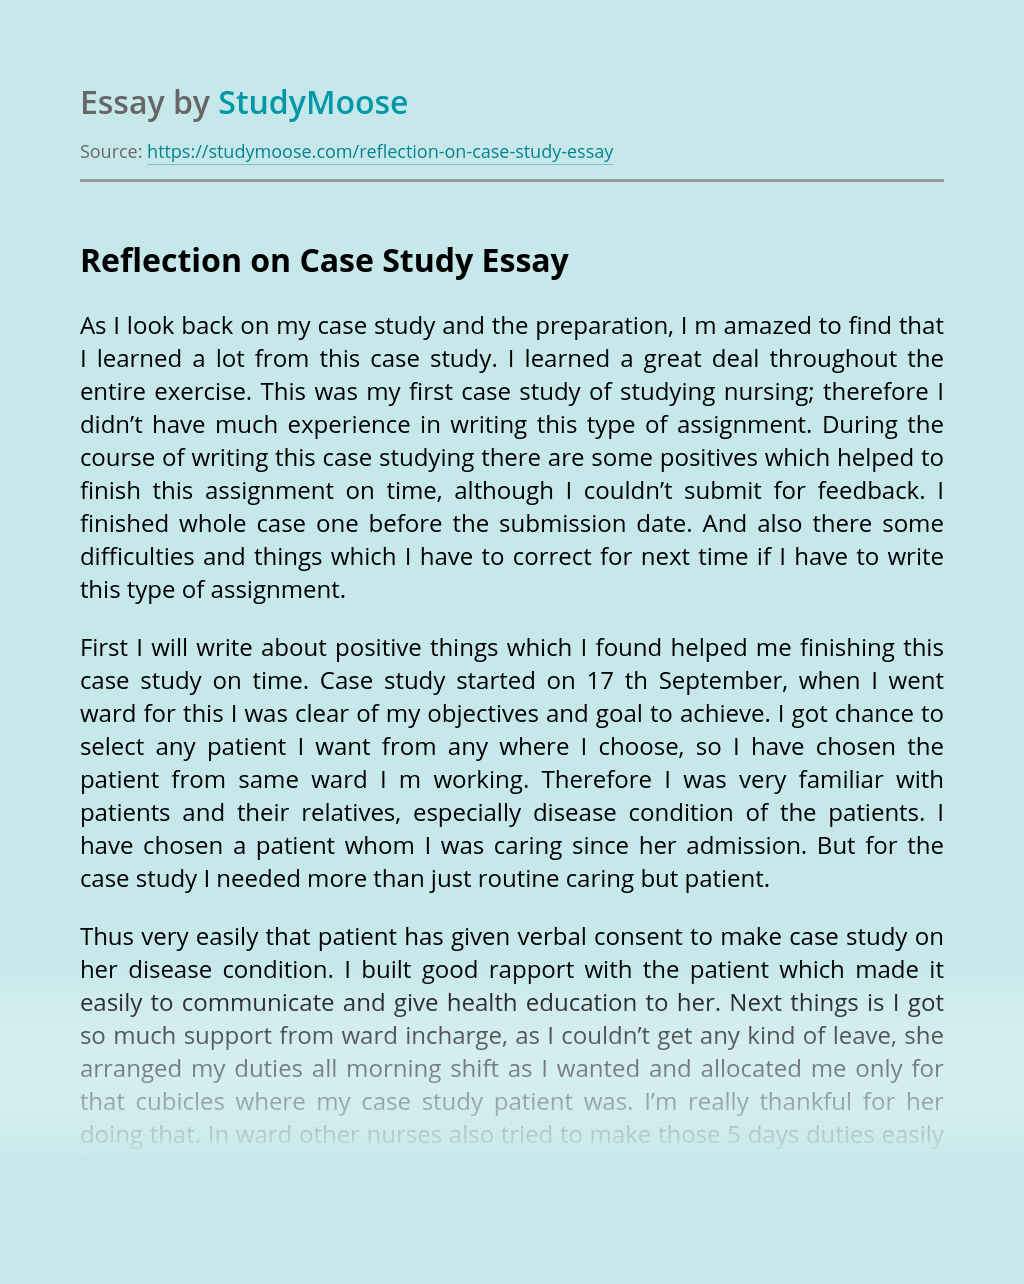 Reflection on Case Study